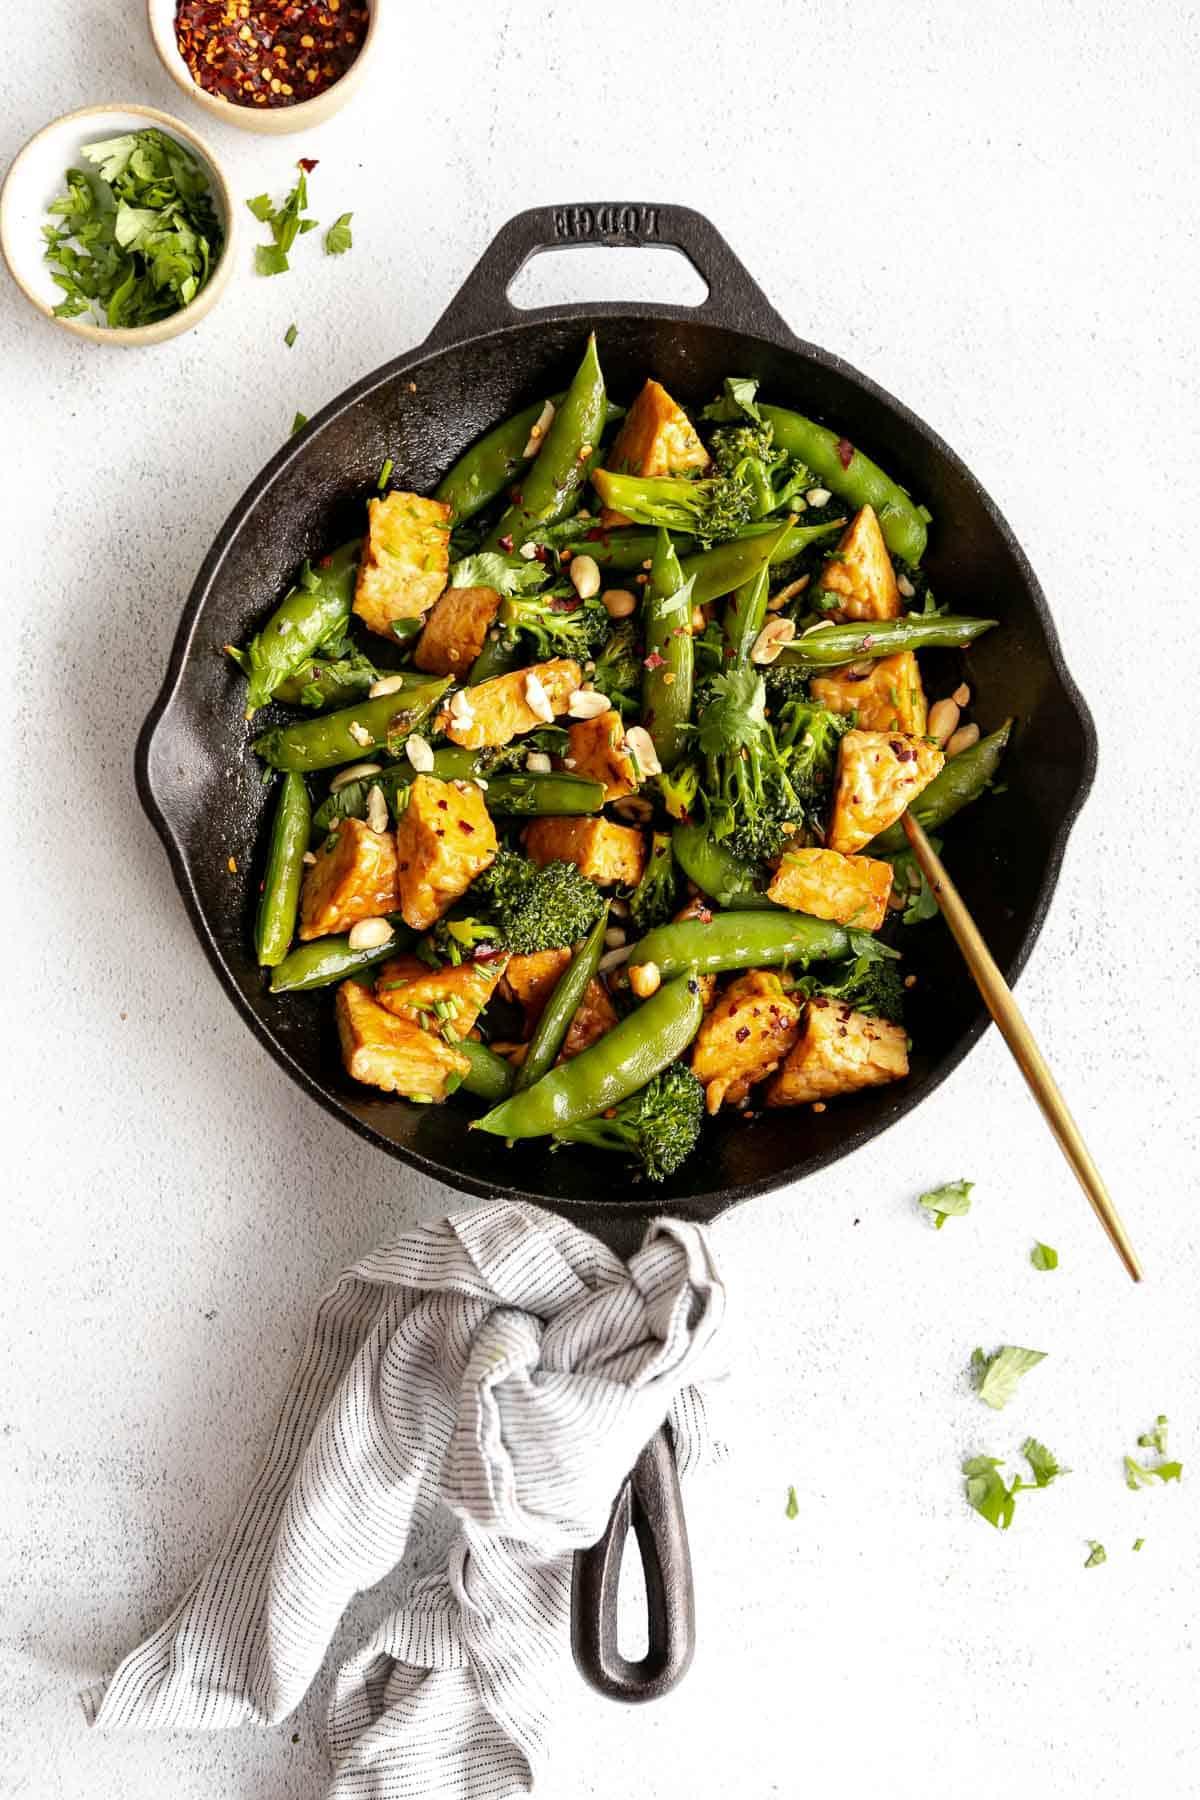 vegan tempeh stir fry with peanuts in a skillet